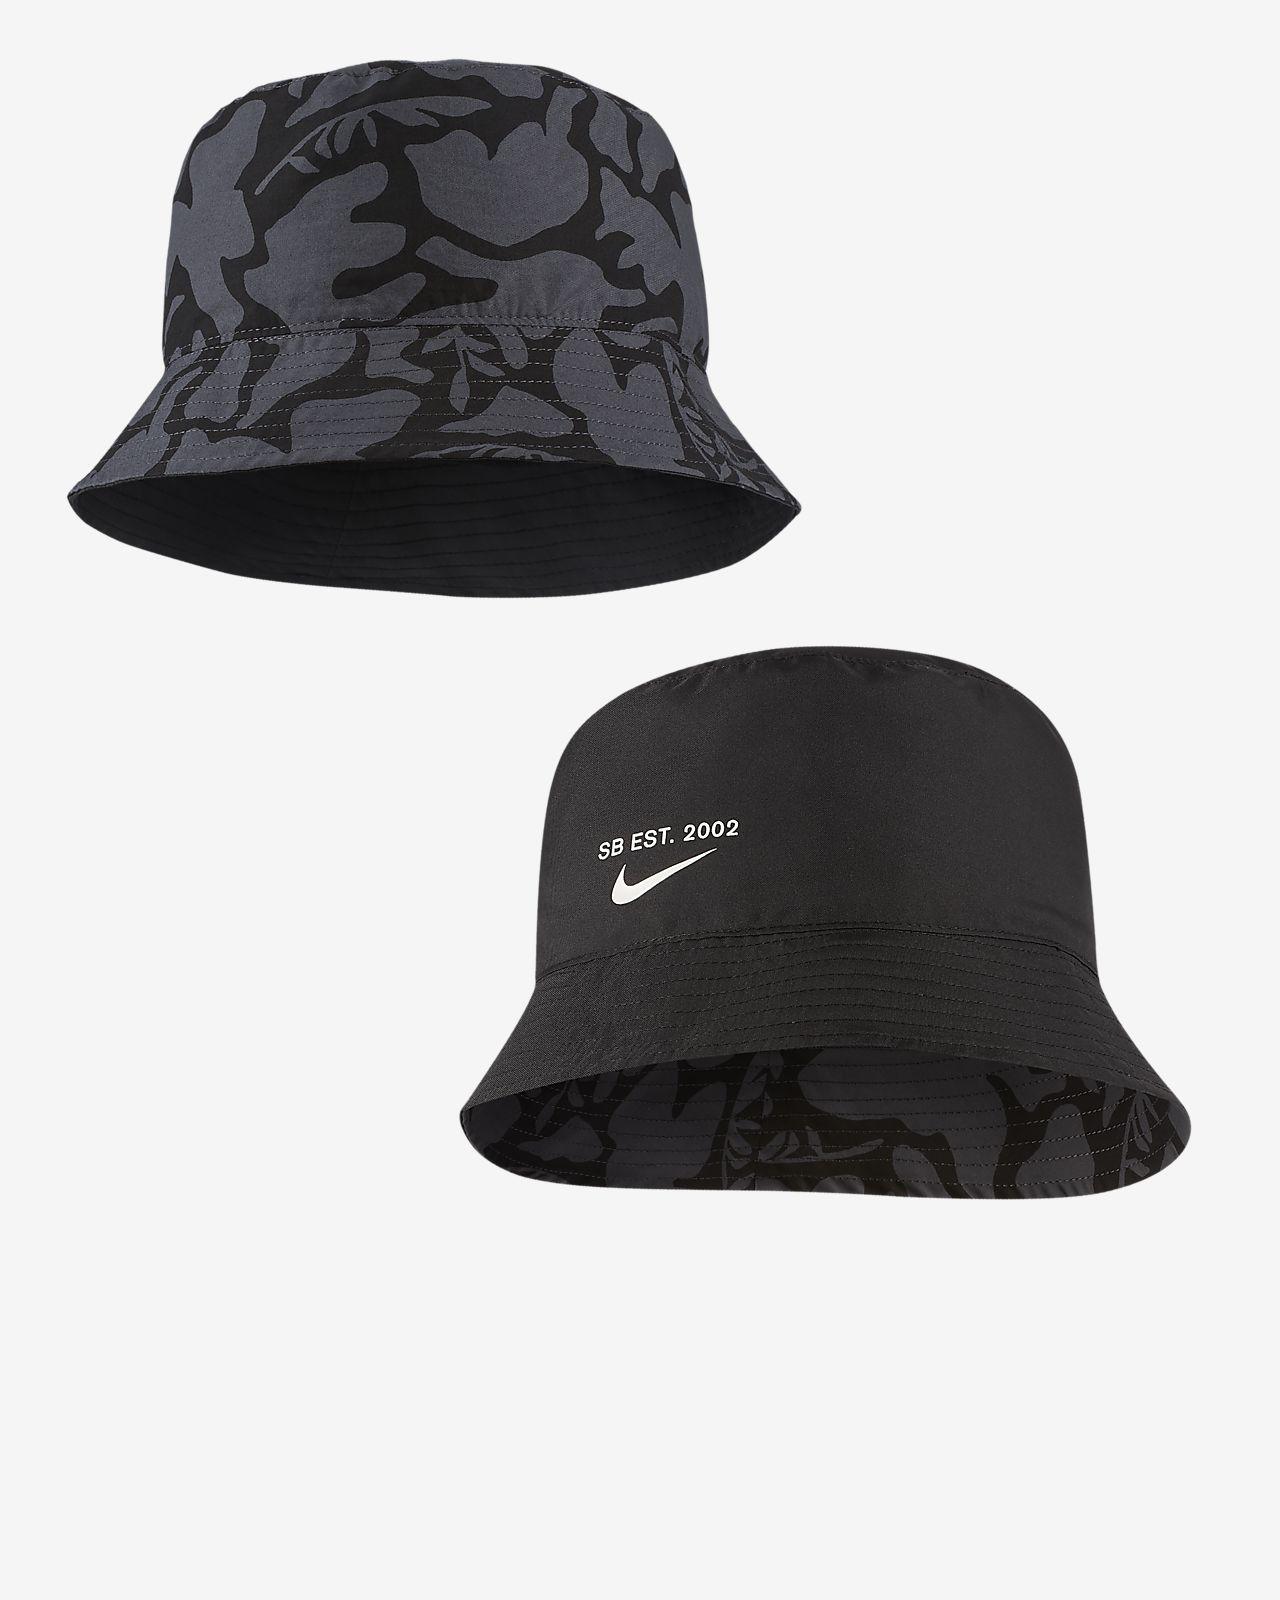 6c52f26410737 Nike SB Printed Skate Bucket Hat. Nike.com CA